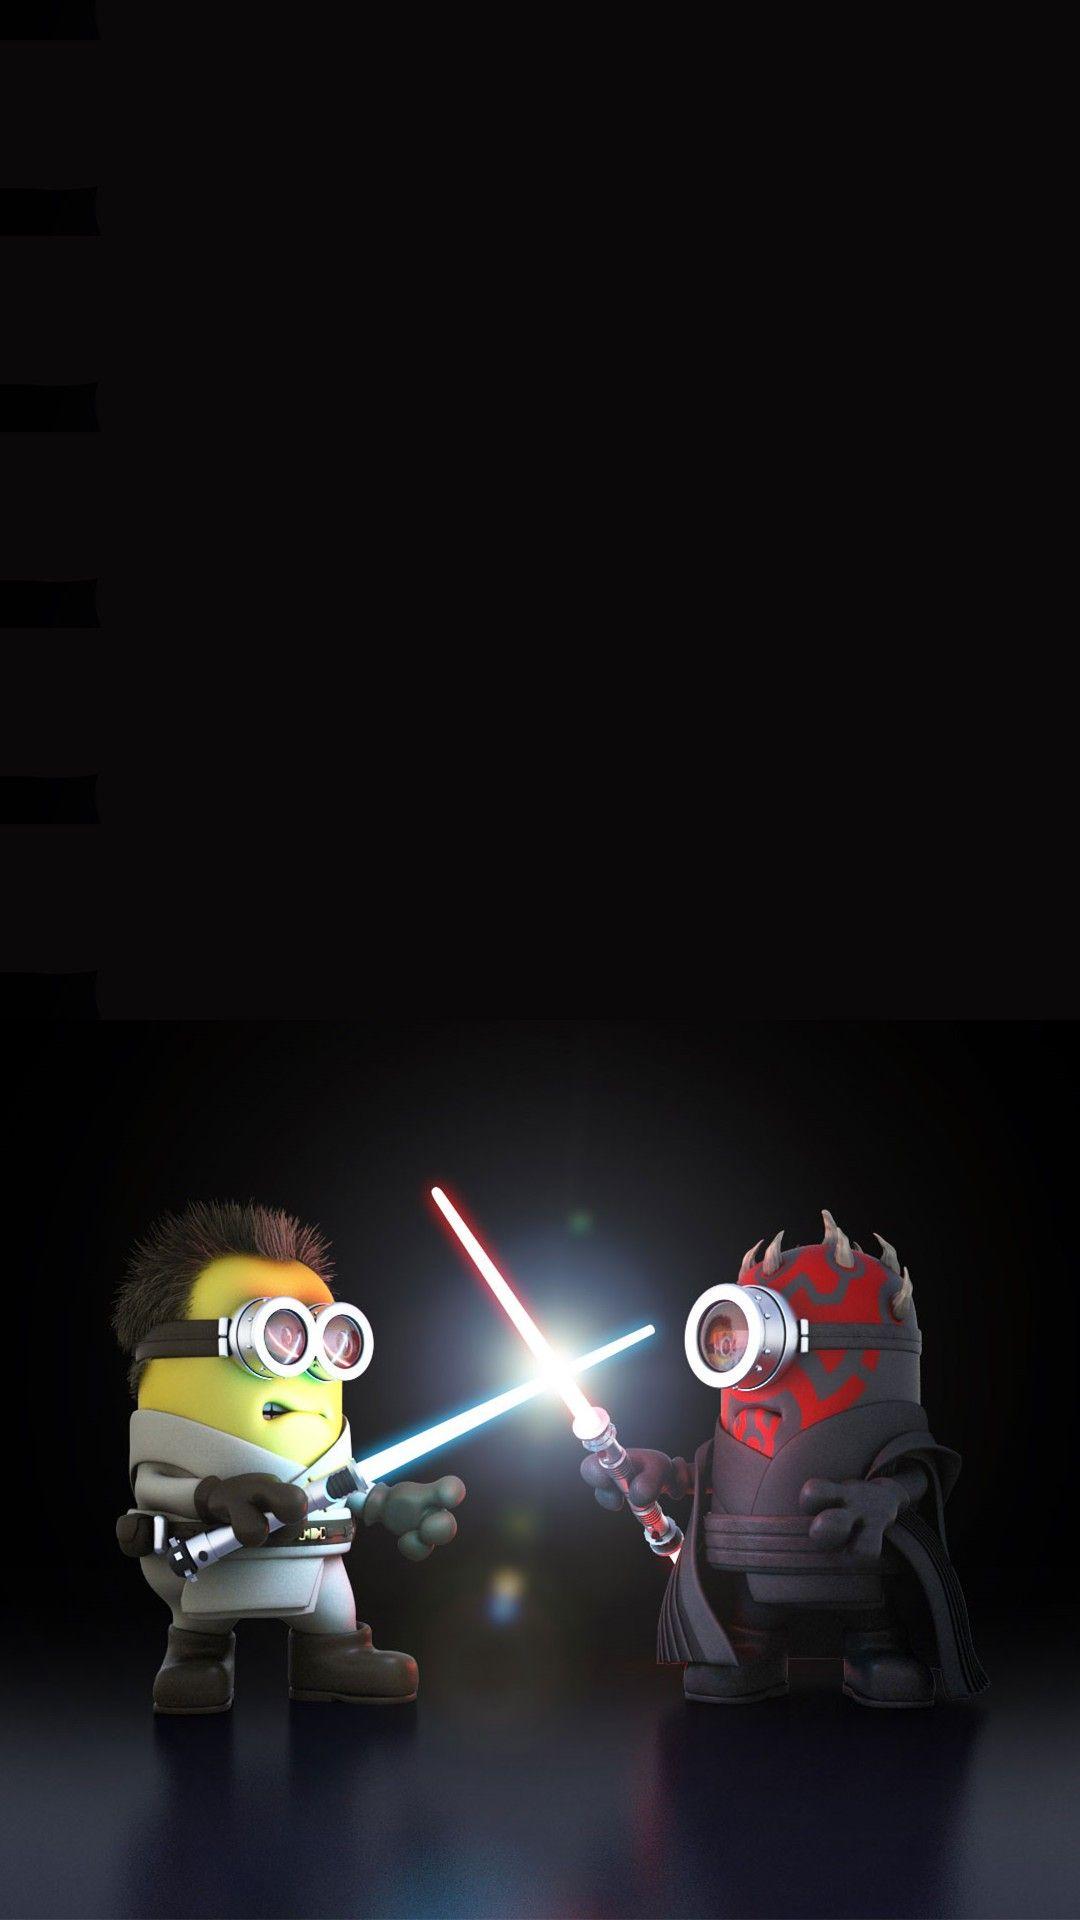 Best Wallpaper Halloween Star Wars - cc73ac3b826dc1ad6f05a0e6d05b15d3  Trends_312933.jpg